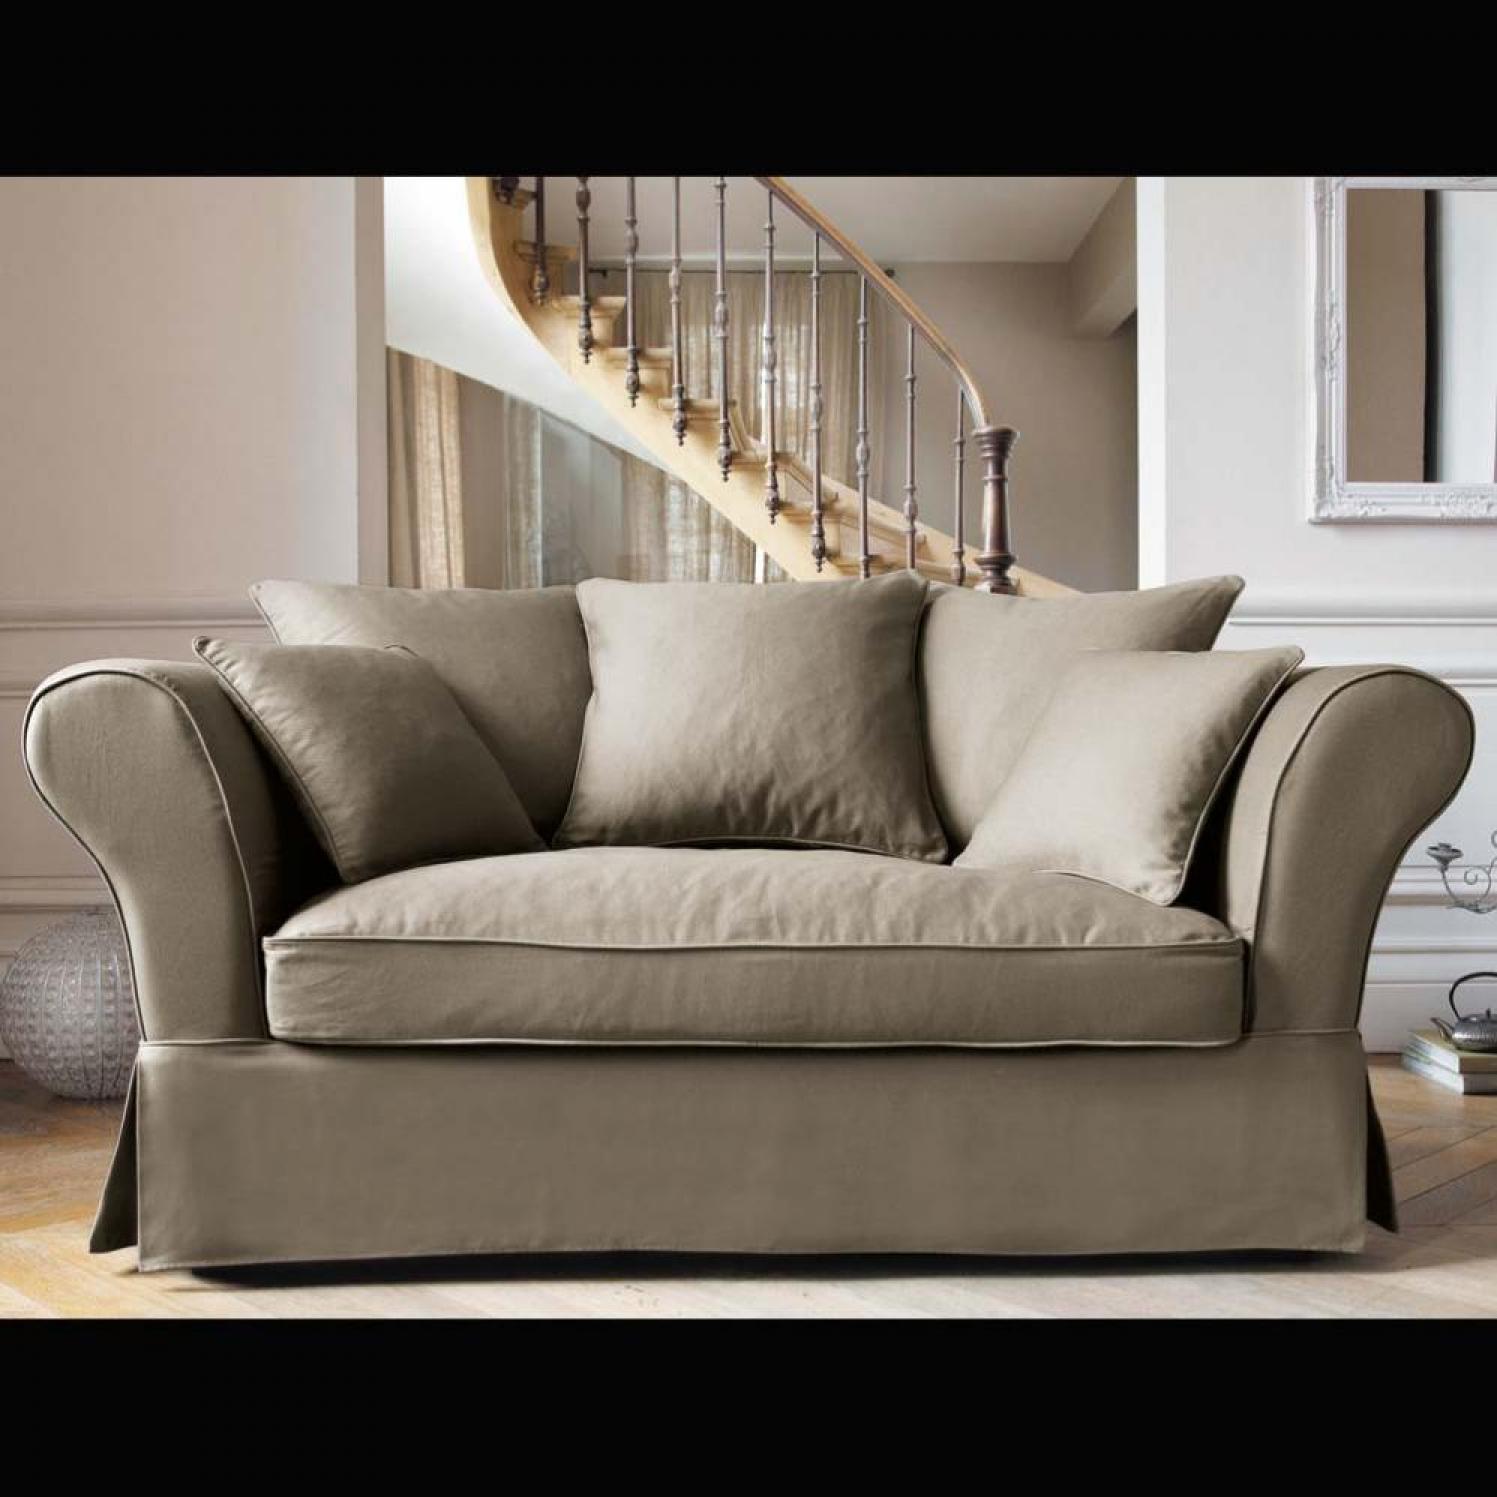 photos canap maison du monde roma. Black Bedroom Furniture Sets. Home Design Ideas